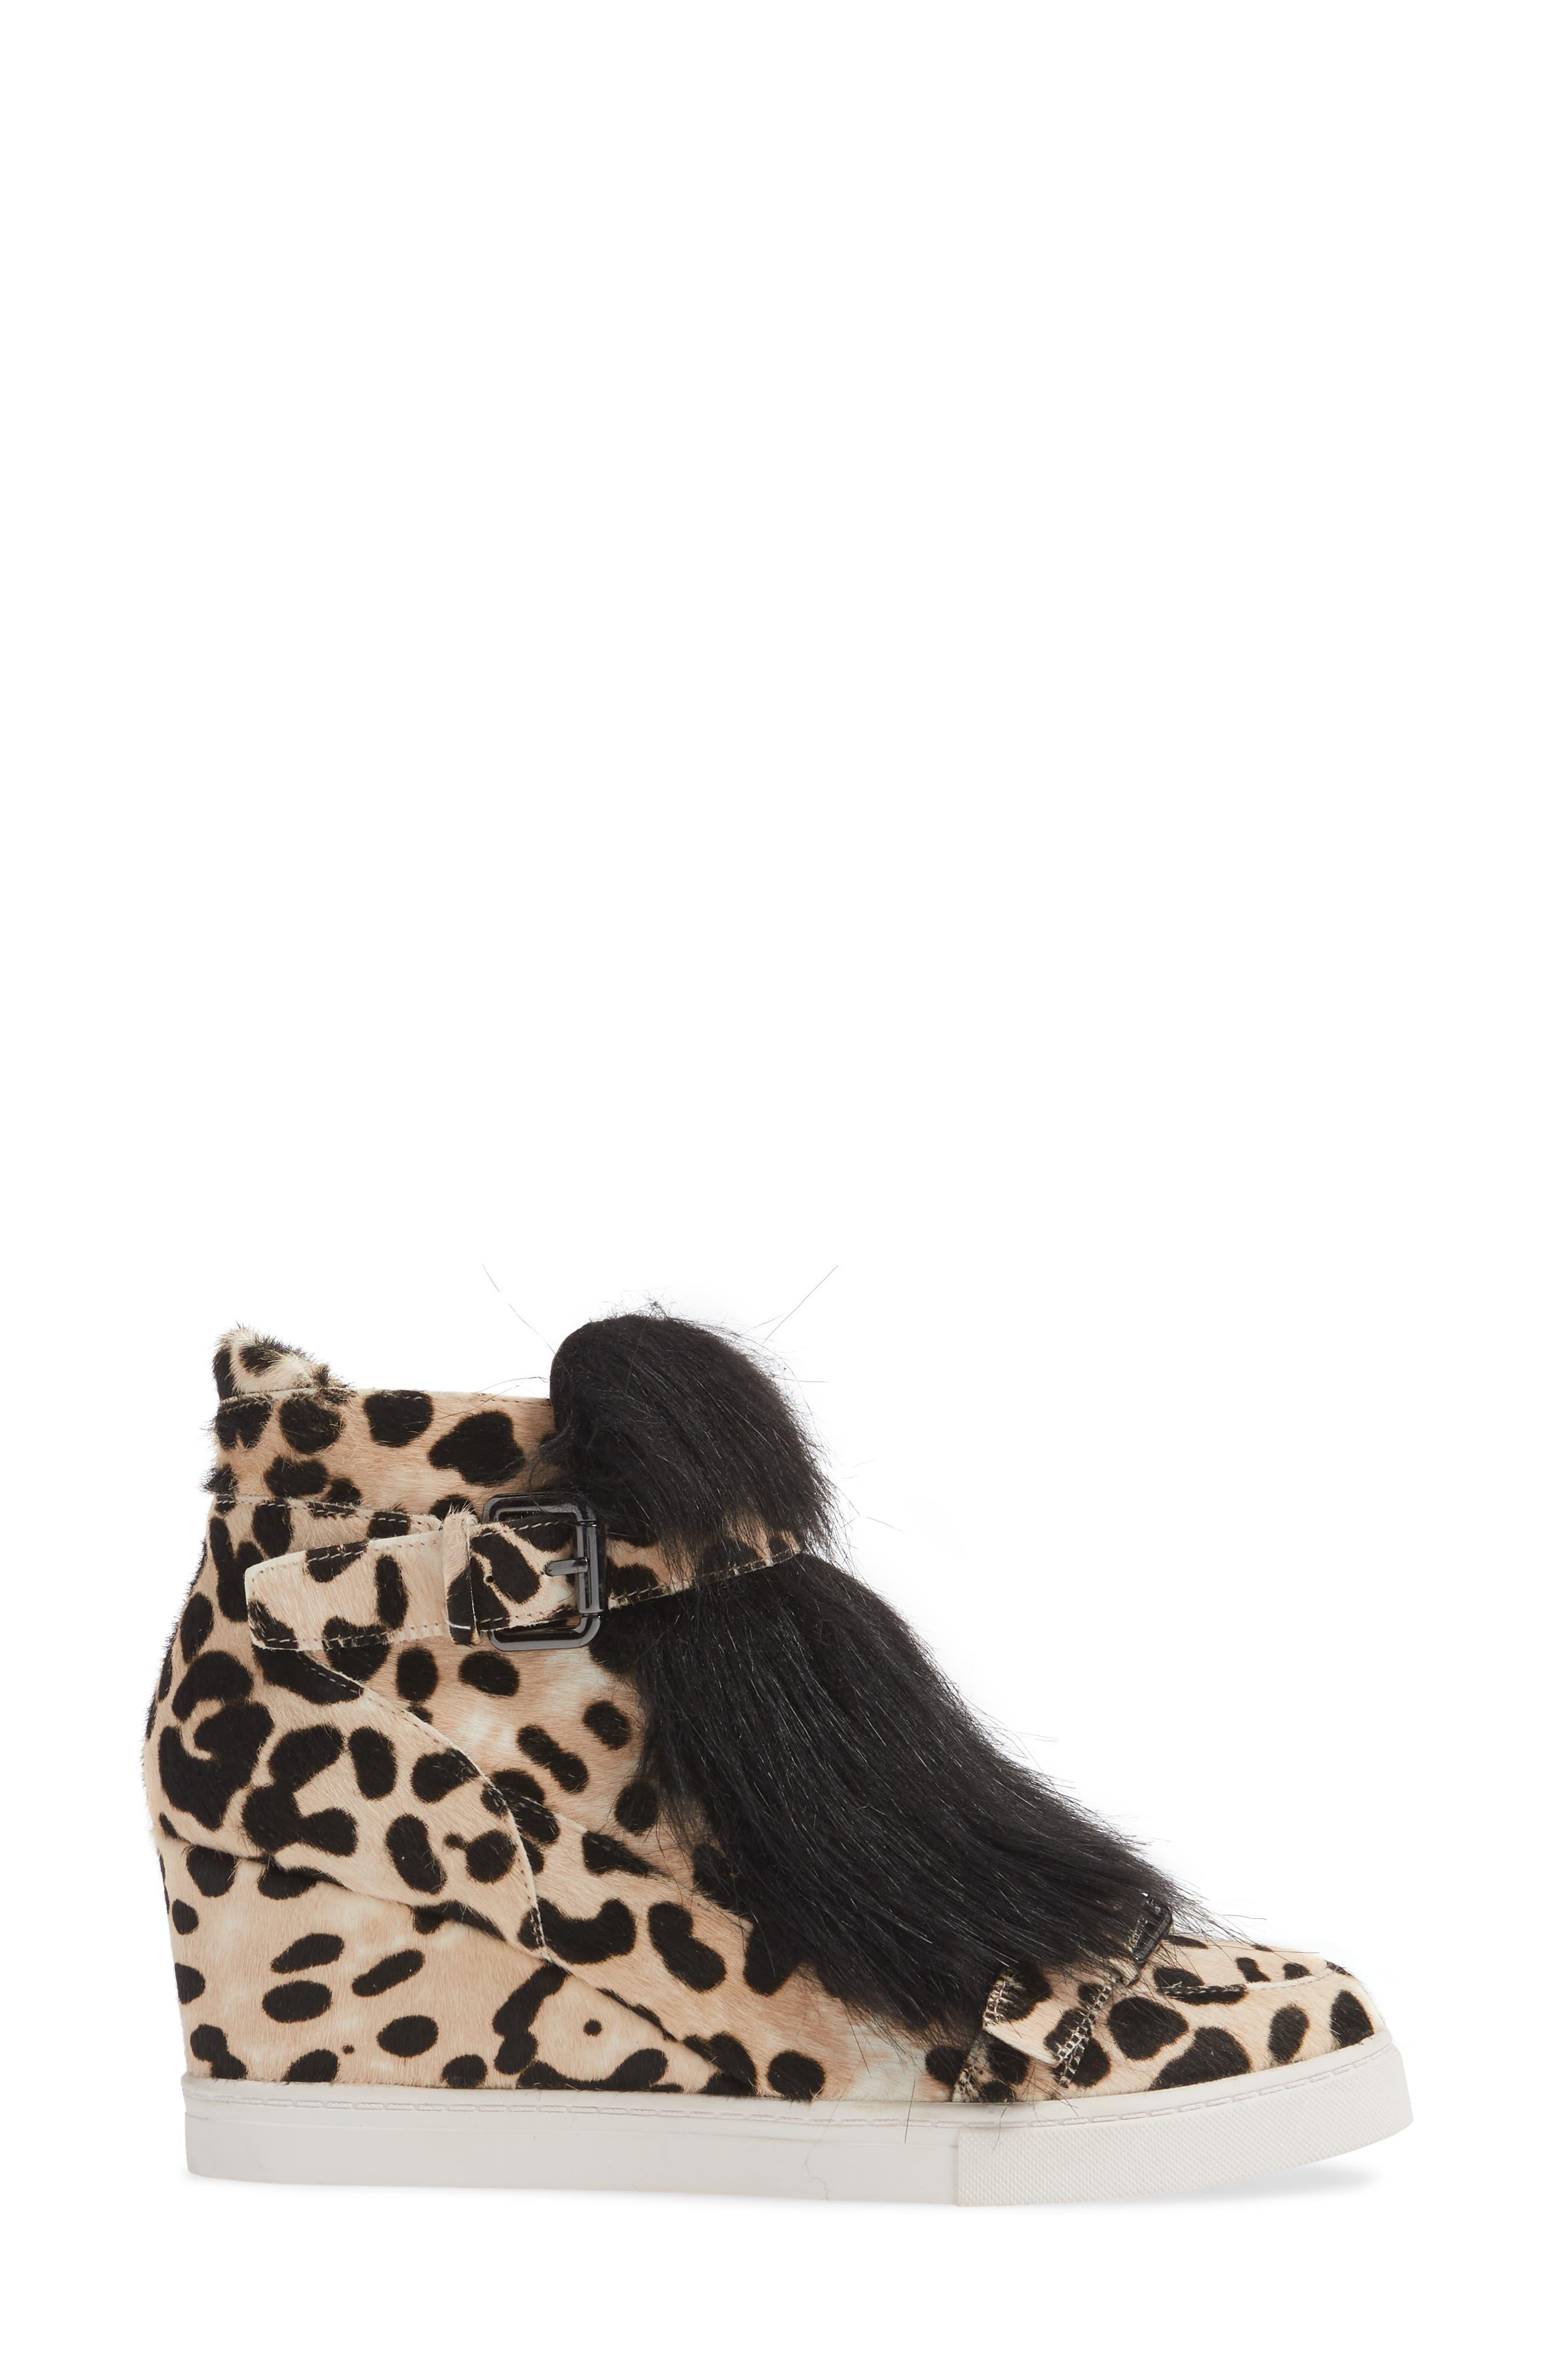 LINEA PAOLO, Fifi 2 Wedge Sneaker, Alternate thumbnail 3, color, WHITE/ BLACK LEOPARD HAIRCALF